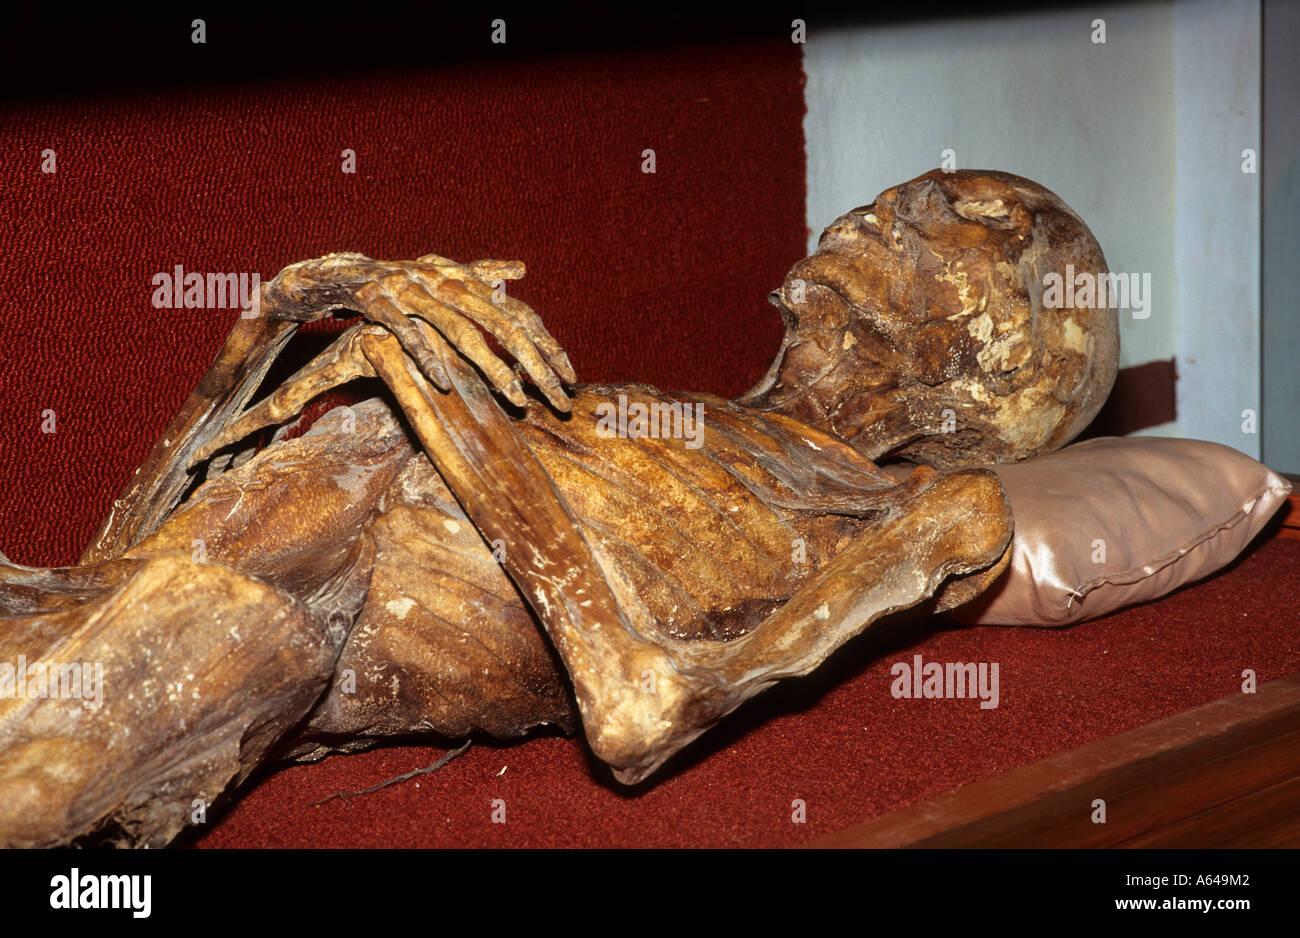 Mexico Guanajuato city Panteon mummy museum - Stock Image